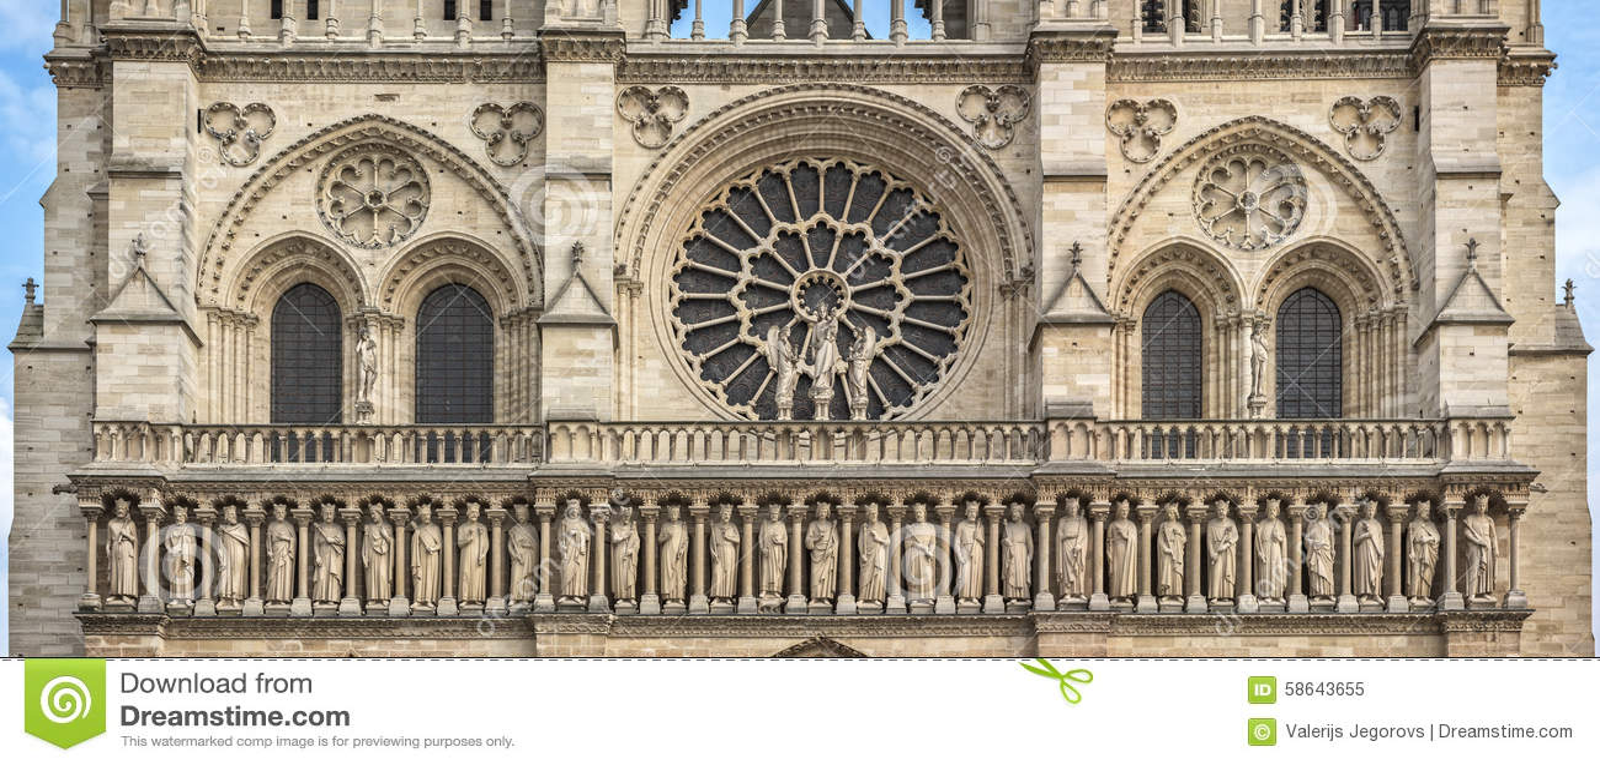 NotreDame de Paris  Wikipedia